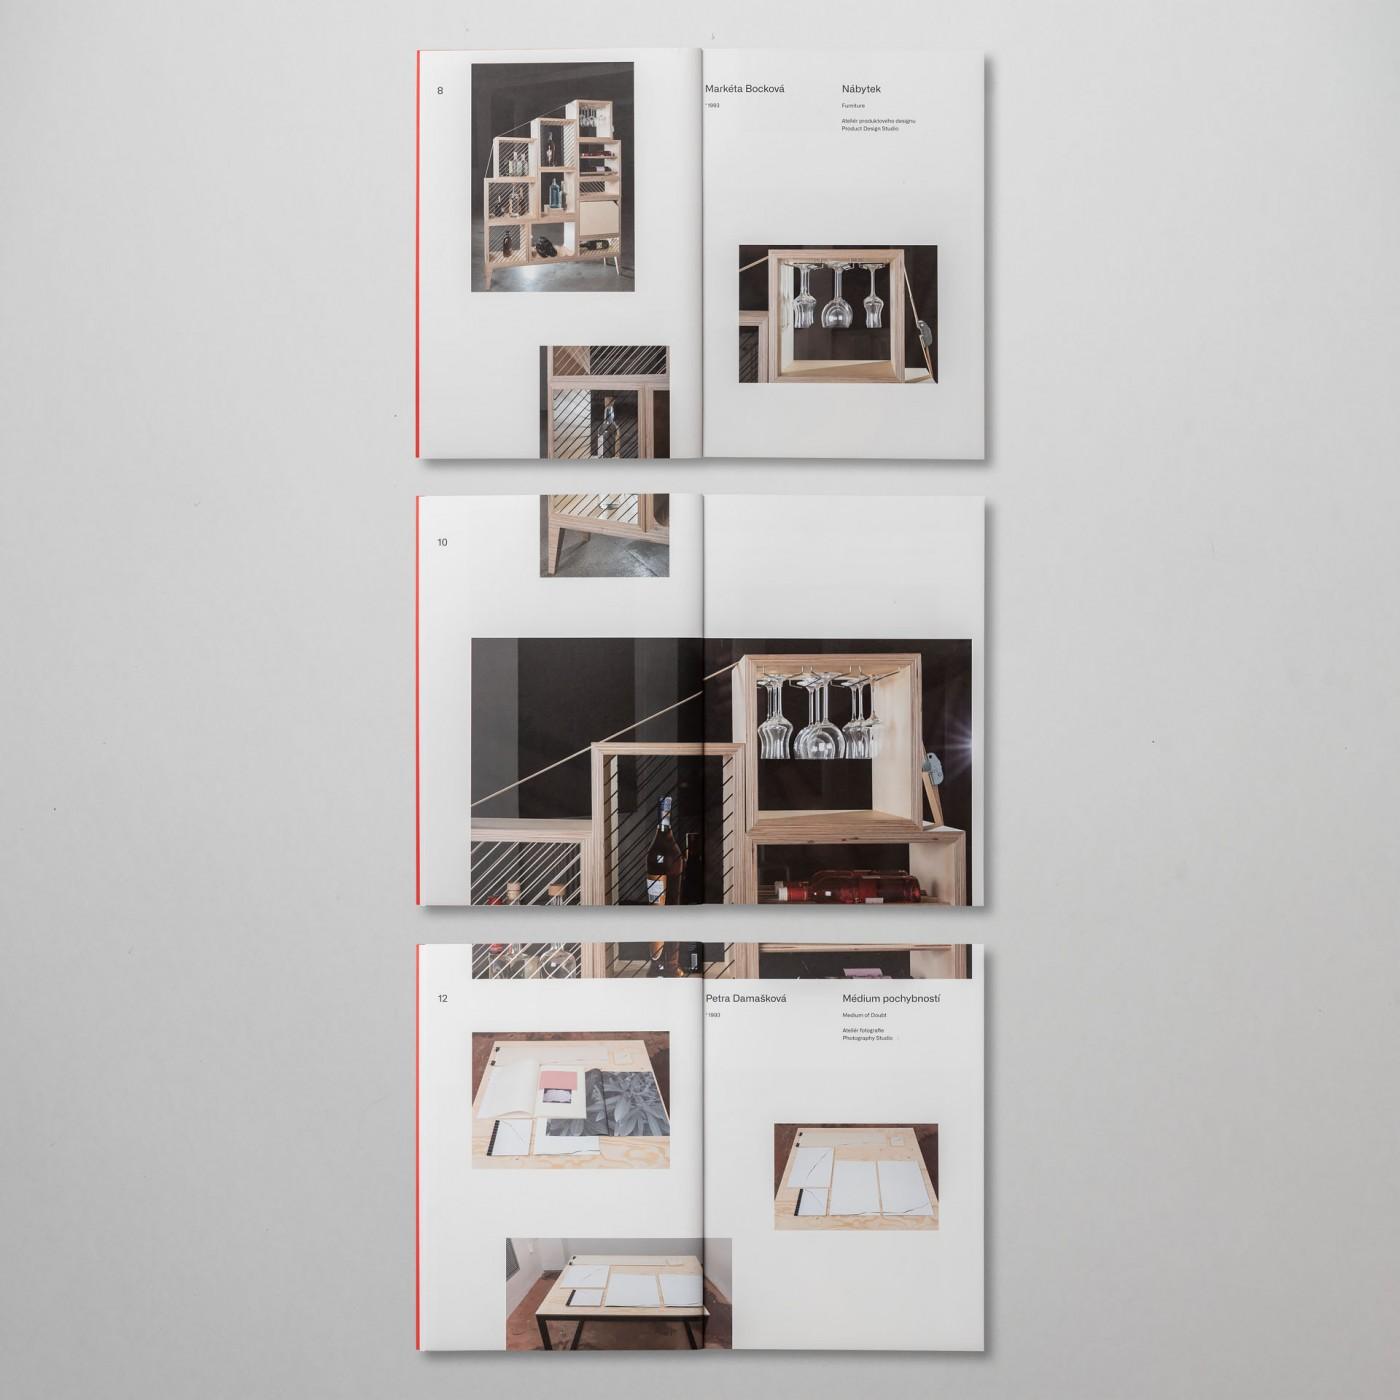 ffa graduates catalogue layout